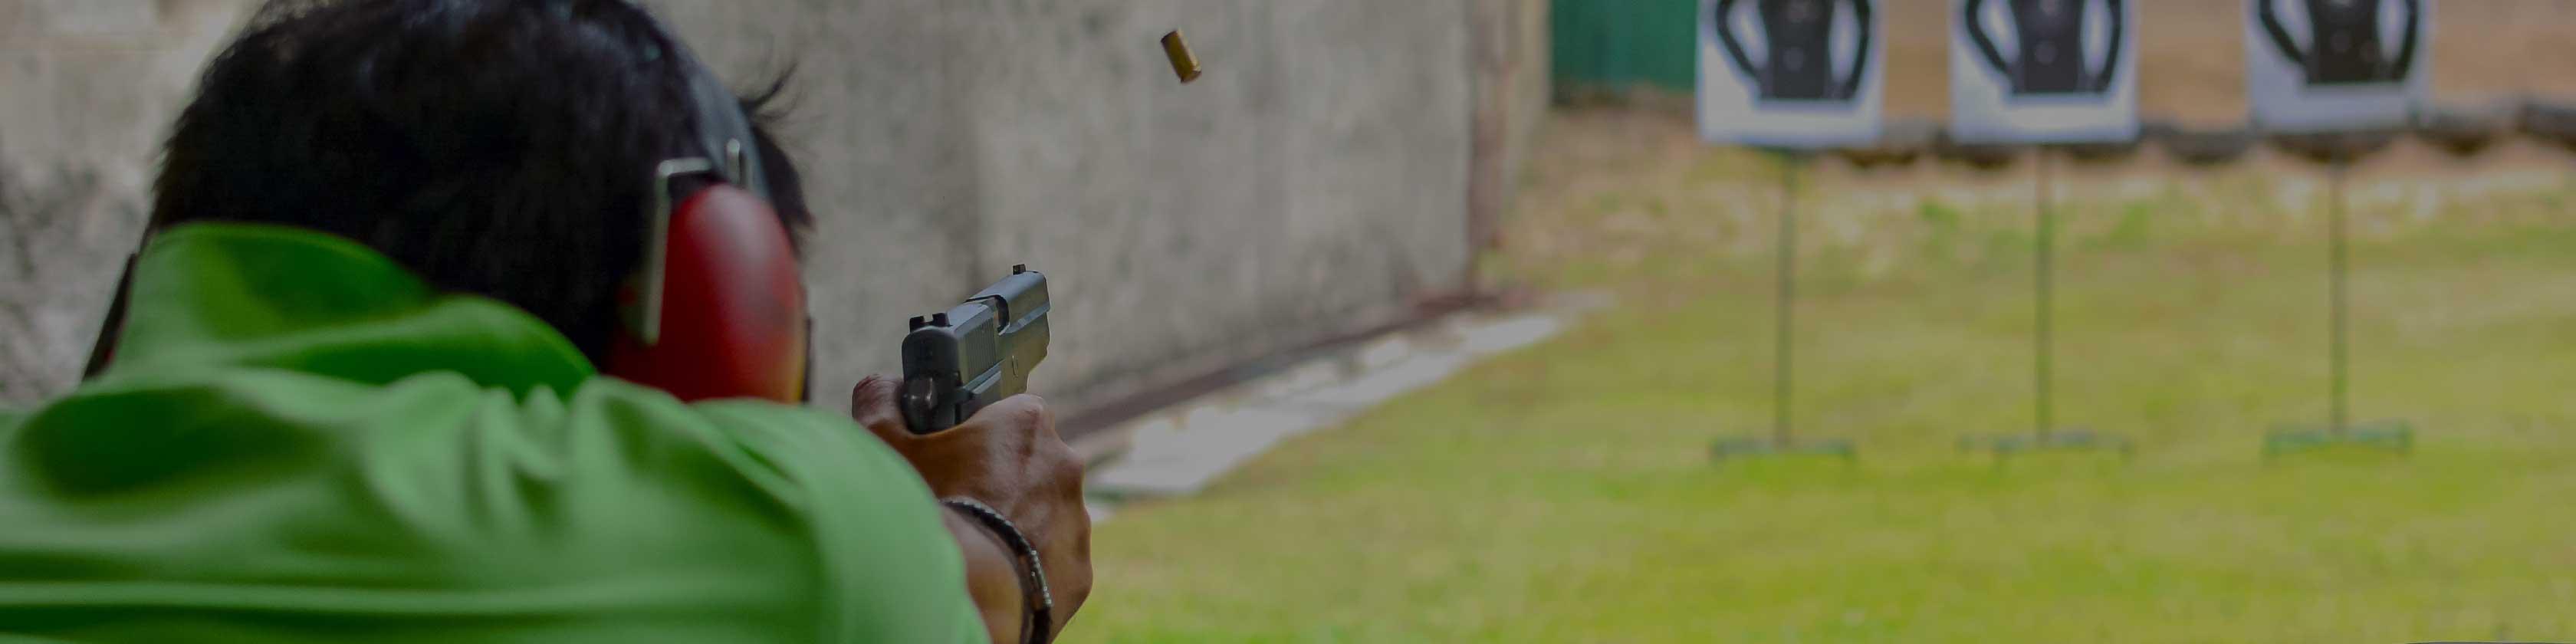 Shop Defensive Handgun Ammo